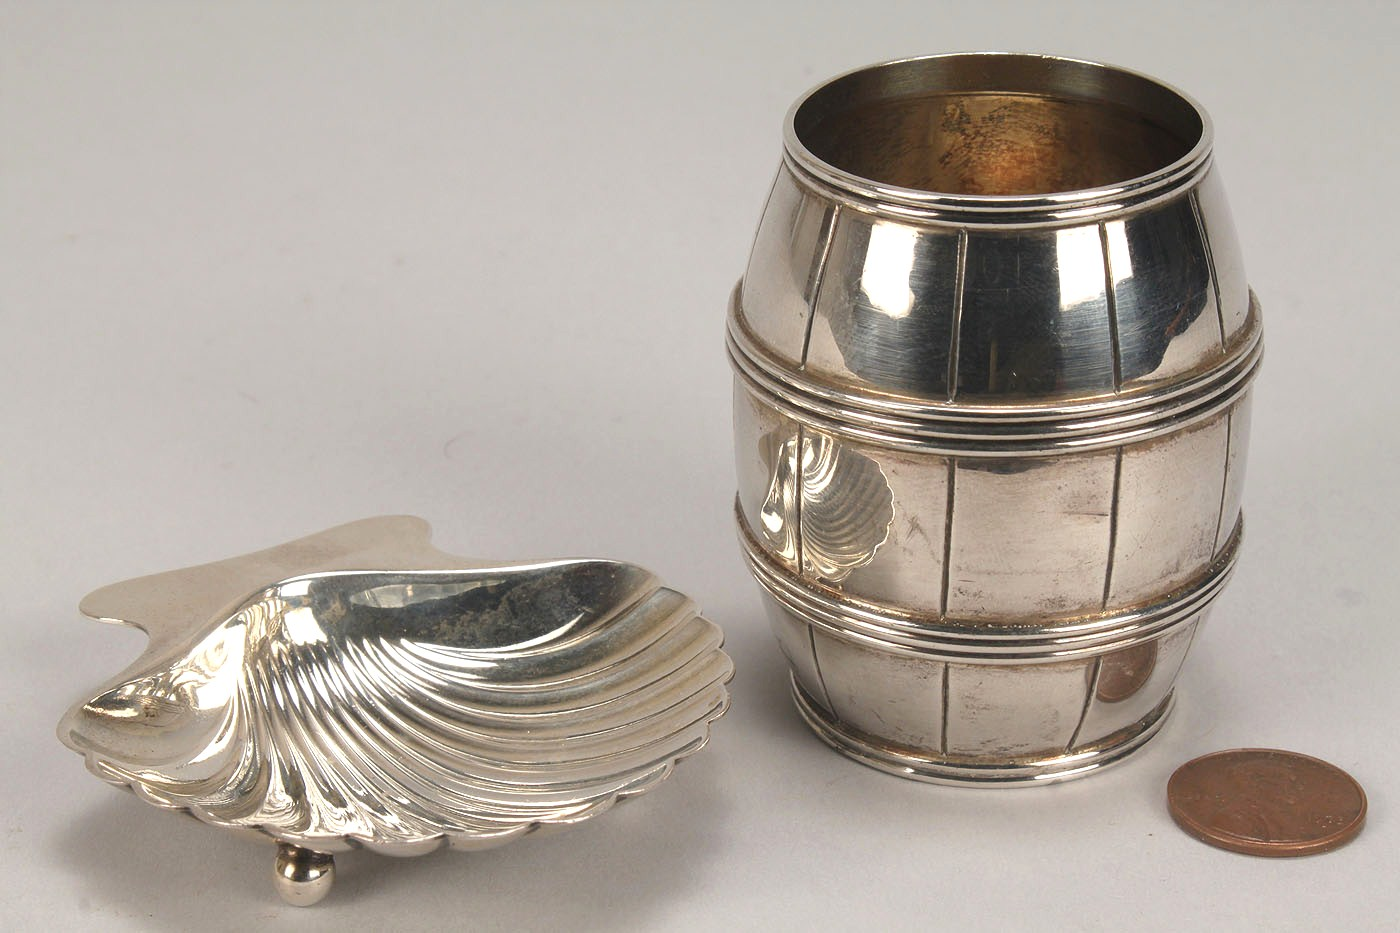 Lot 377 Tiffany Sterling Barrel And Shell Dish